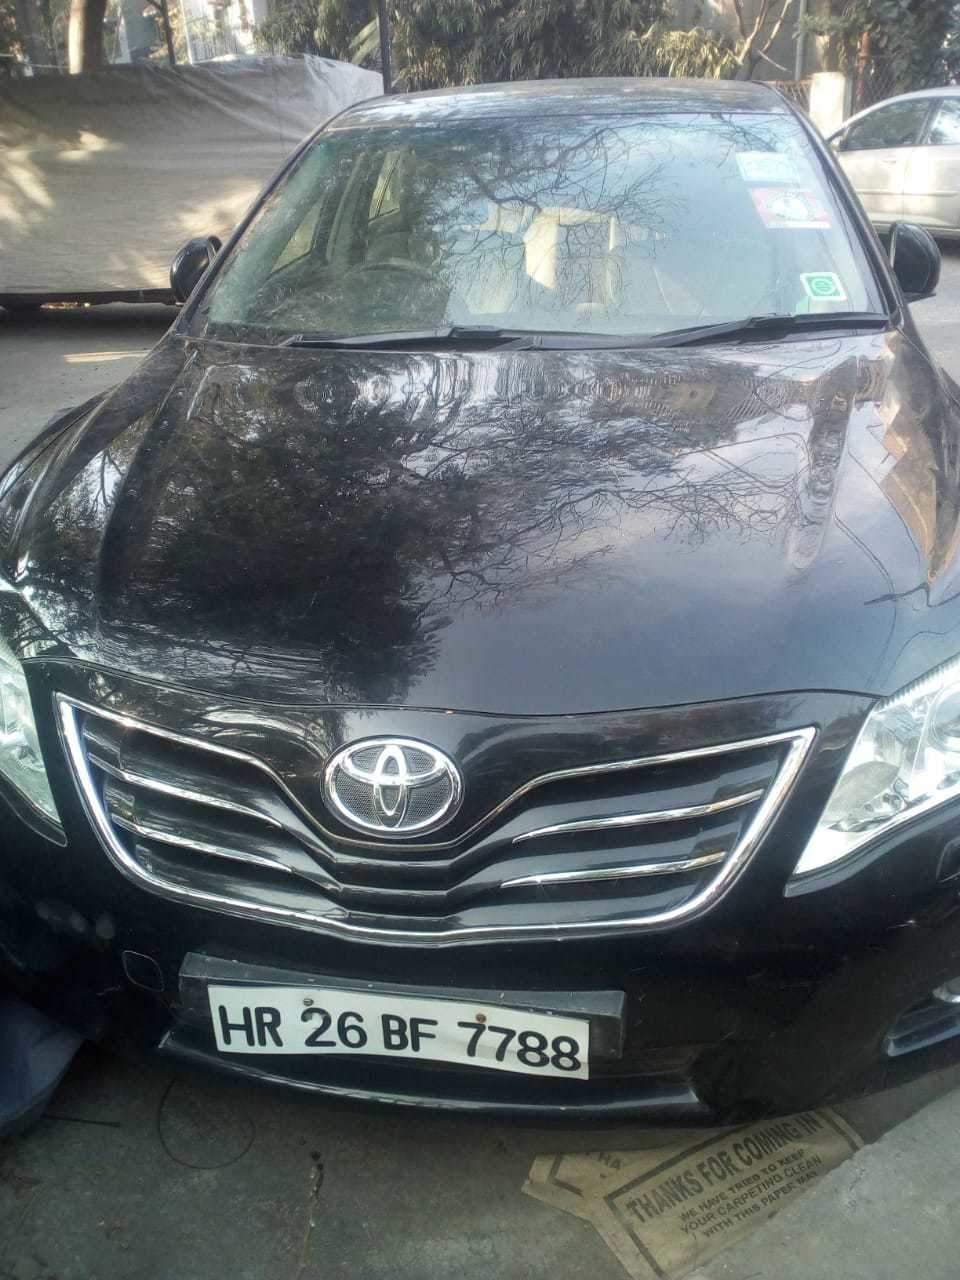 Toyota Camry Front Left Rim